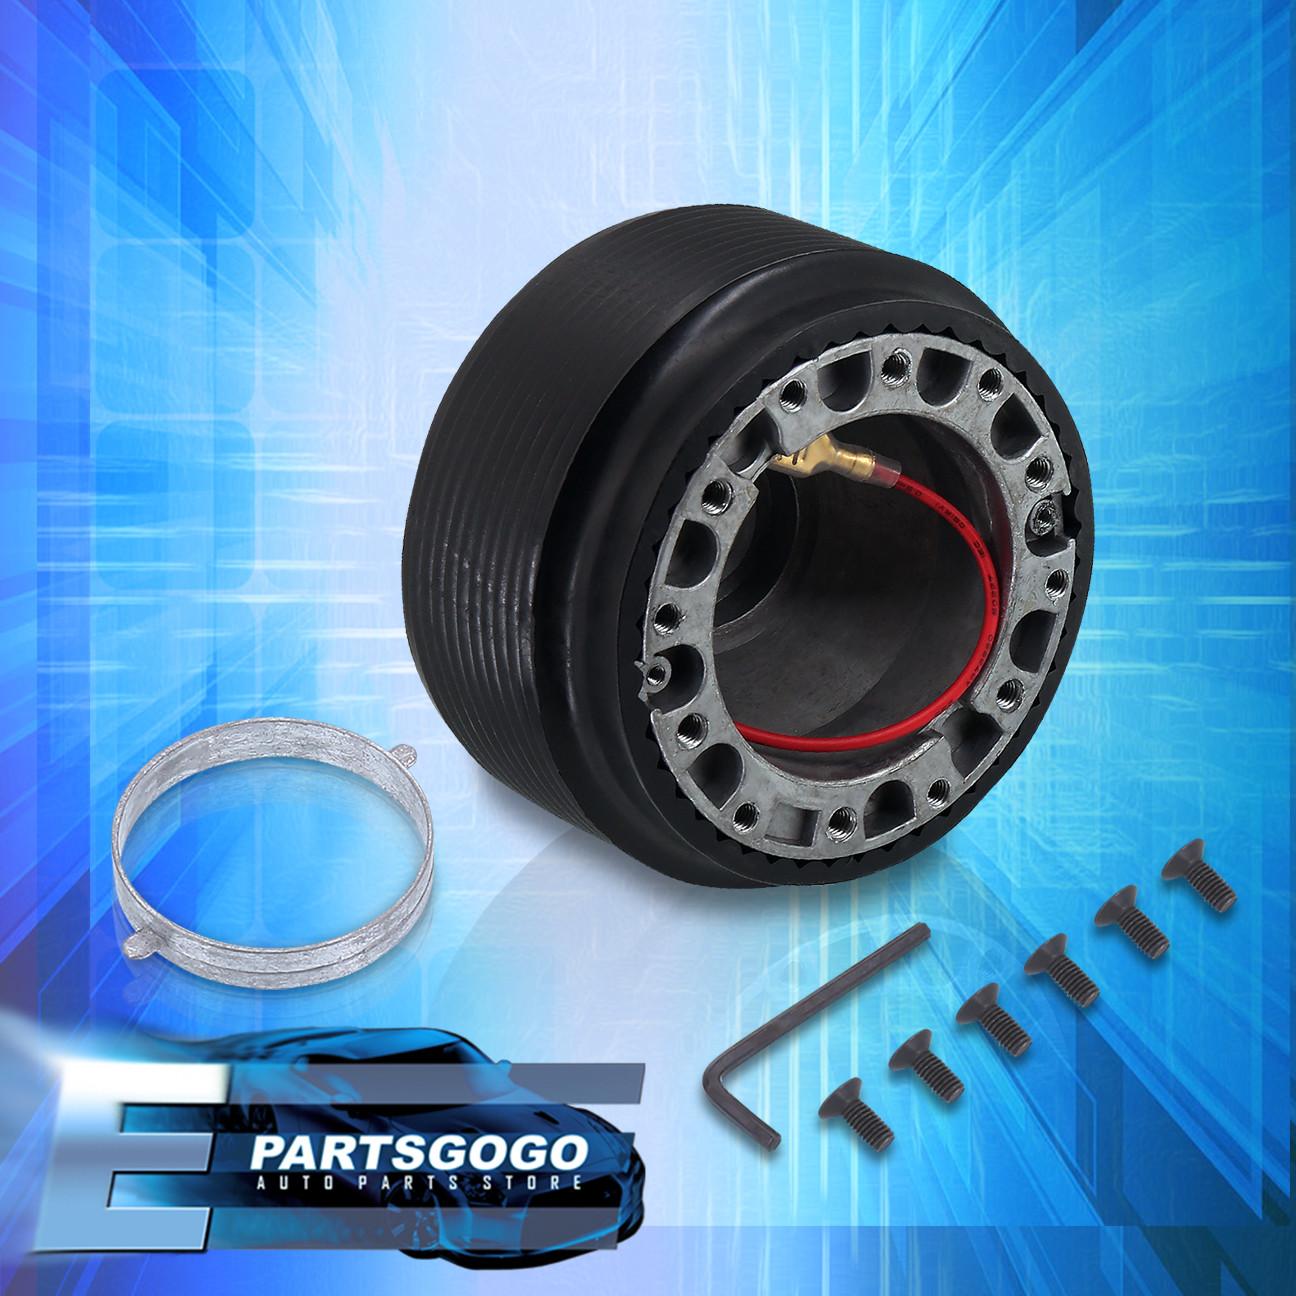 1996 Mazda Miata Electrical Wiring Diagram